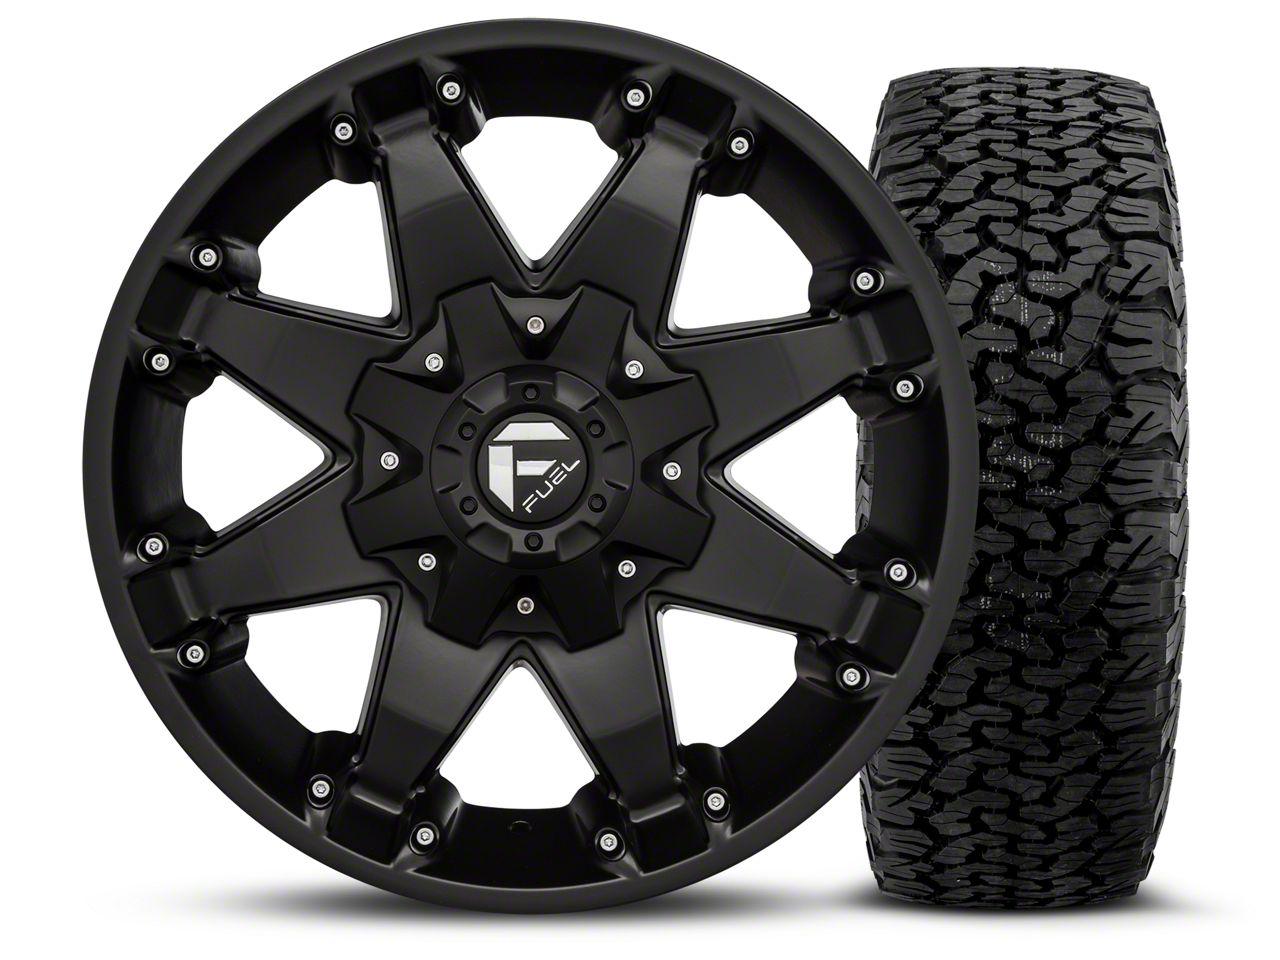 Fuel Wheels Octane - Matte Black 17x8.5 Wheel - and BF Goodrich All Terrain TA KO2 Tire - 315/70R17 (07-18 Jeep Wrangler JK; 2018 Jeep Wrangler JL)